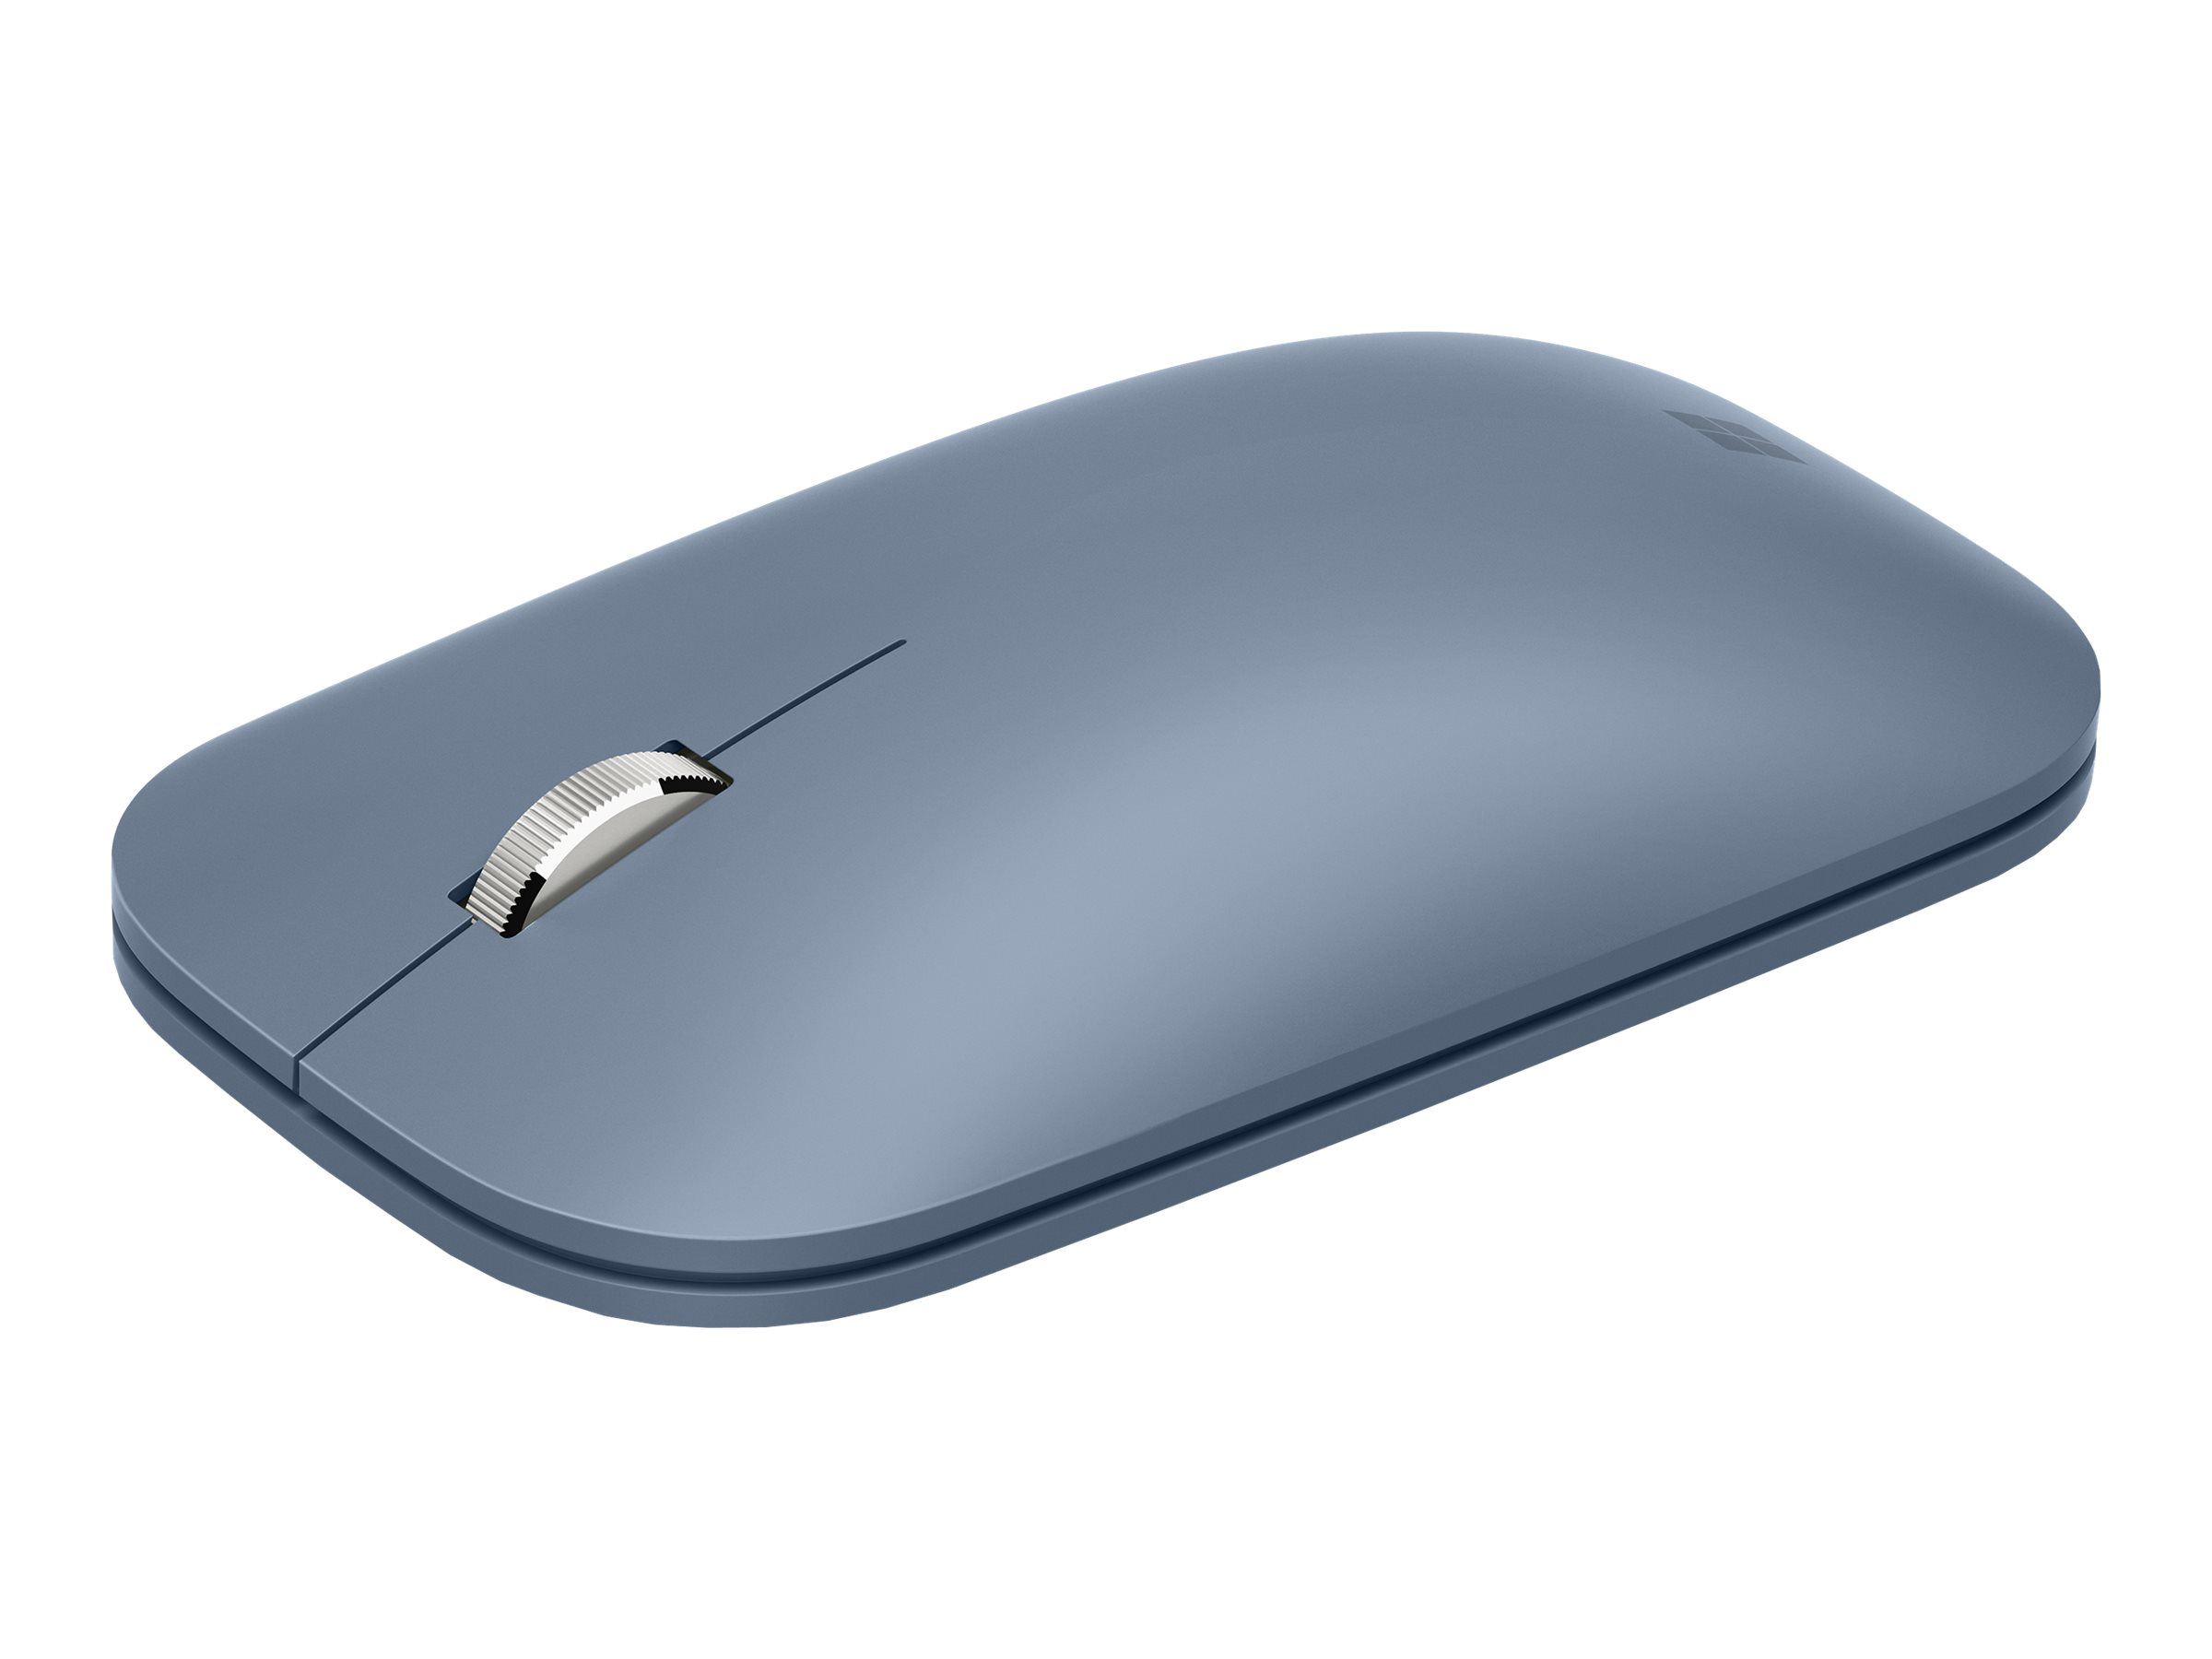 Surface mobile mouse maus optisch 3 tasten kabellos bluetooth 4 2 12933327 kgy 00042